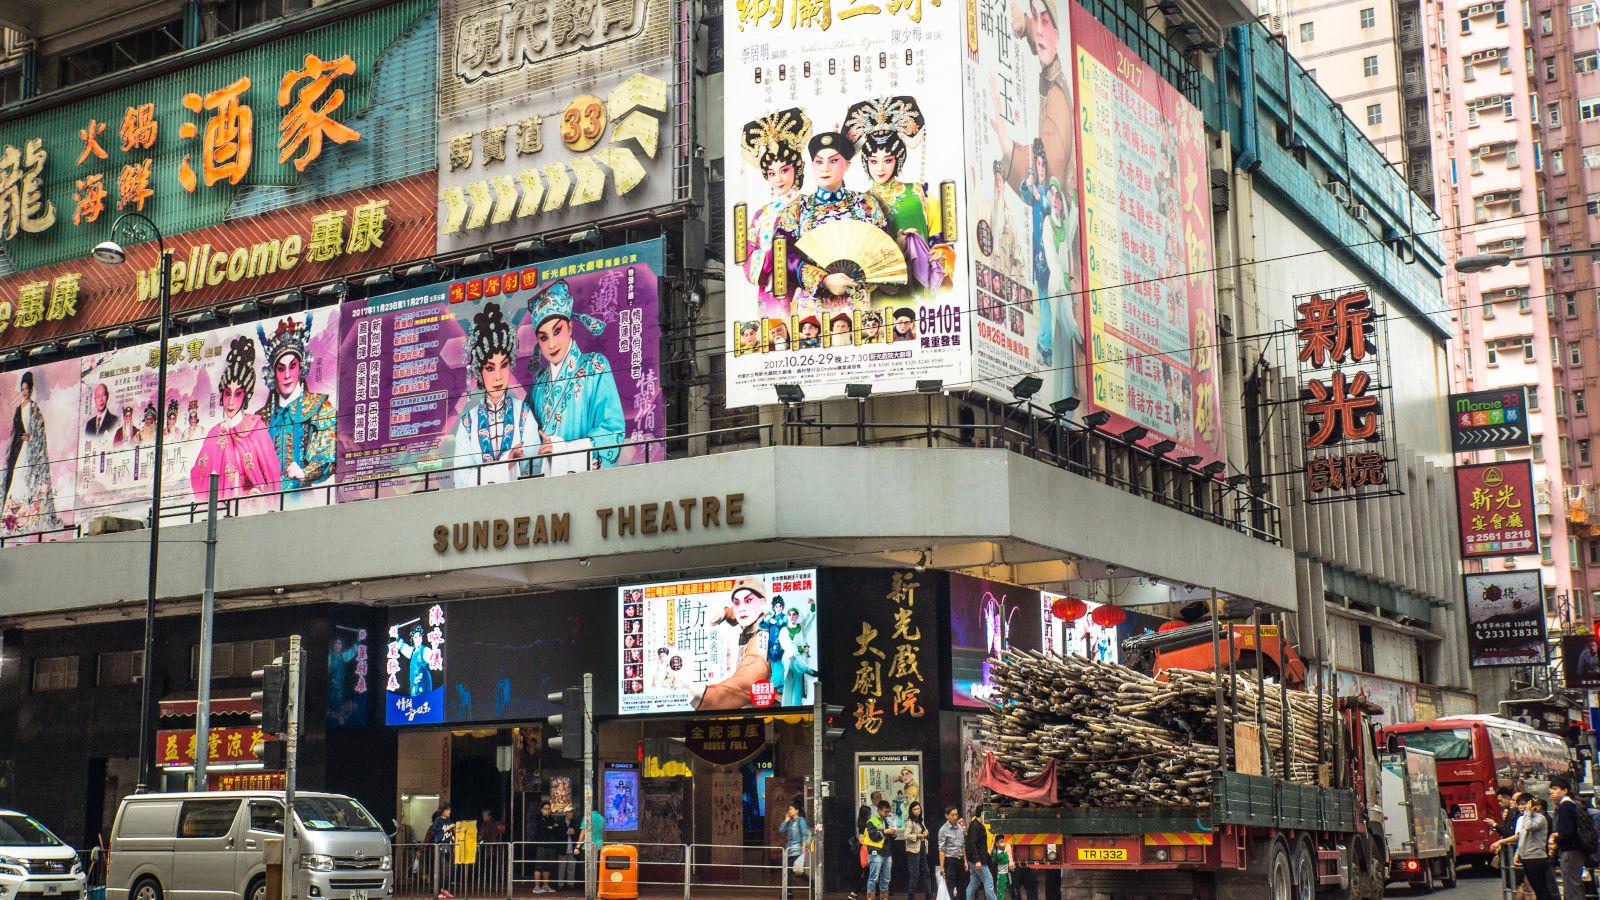 China Censors Hong Kong's Cinemas Banning Movies Considered a National Security Risk